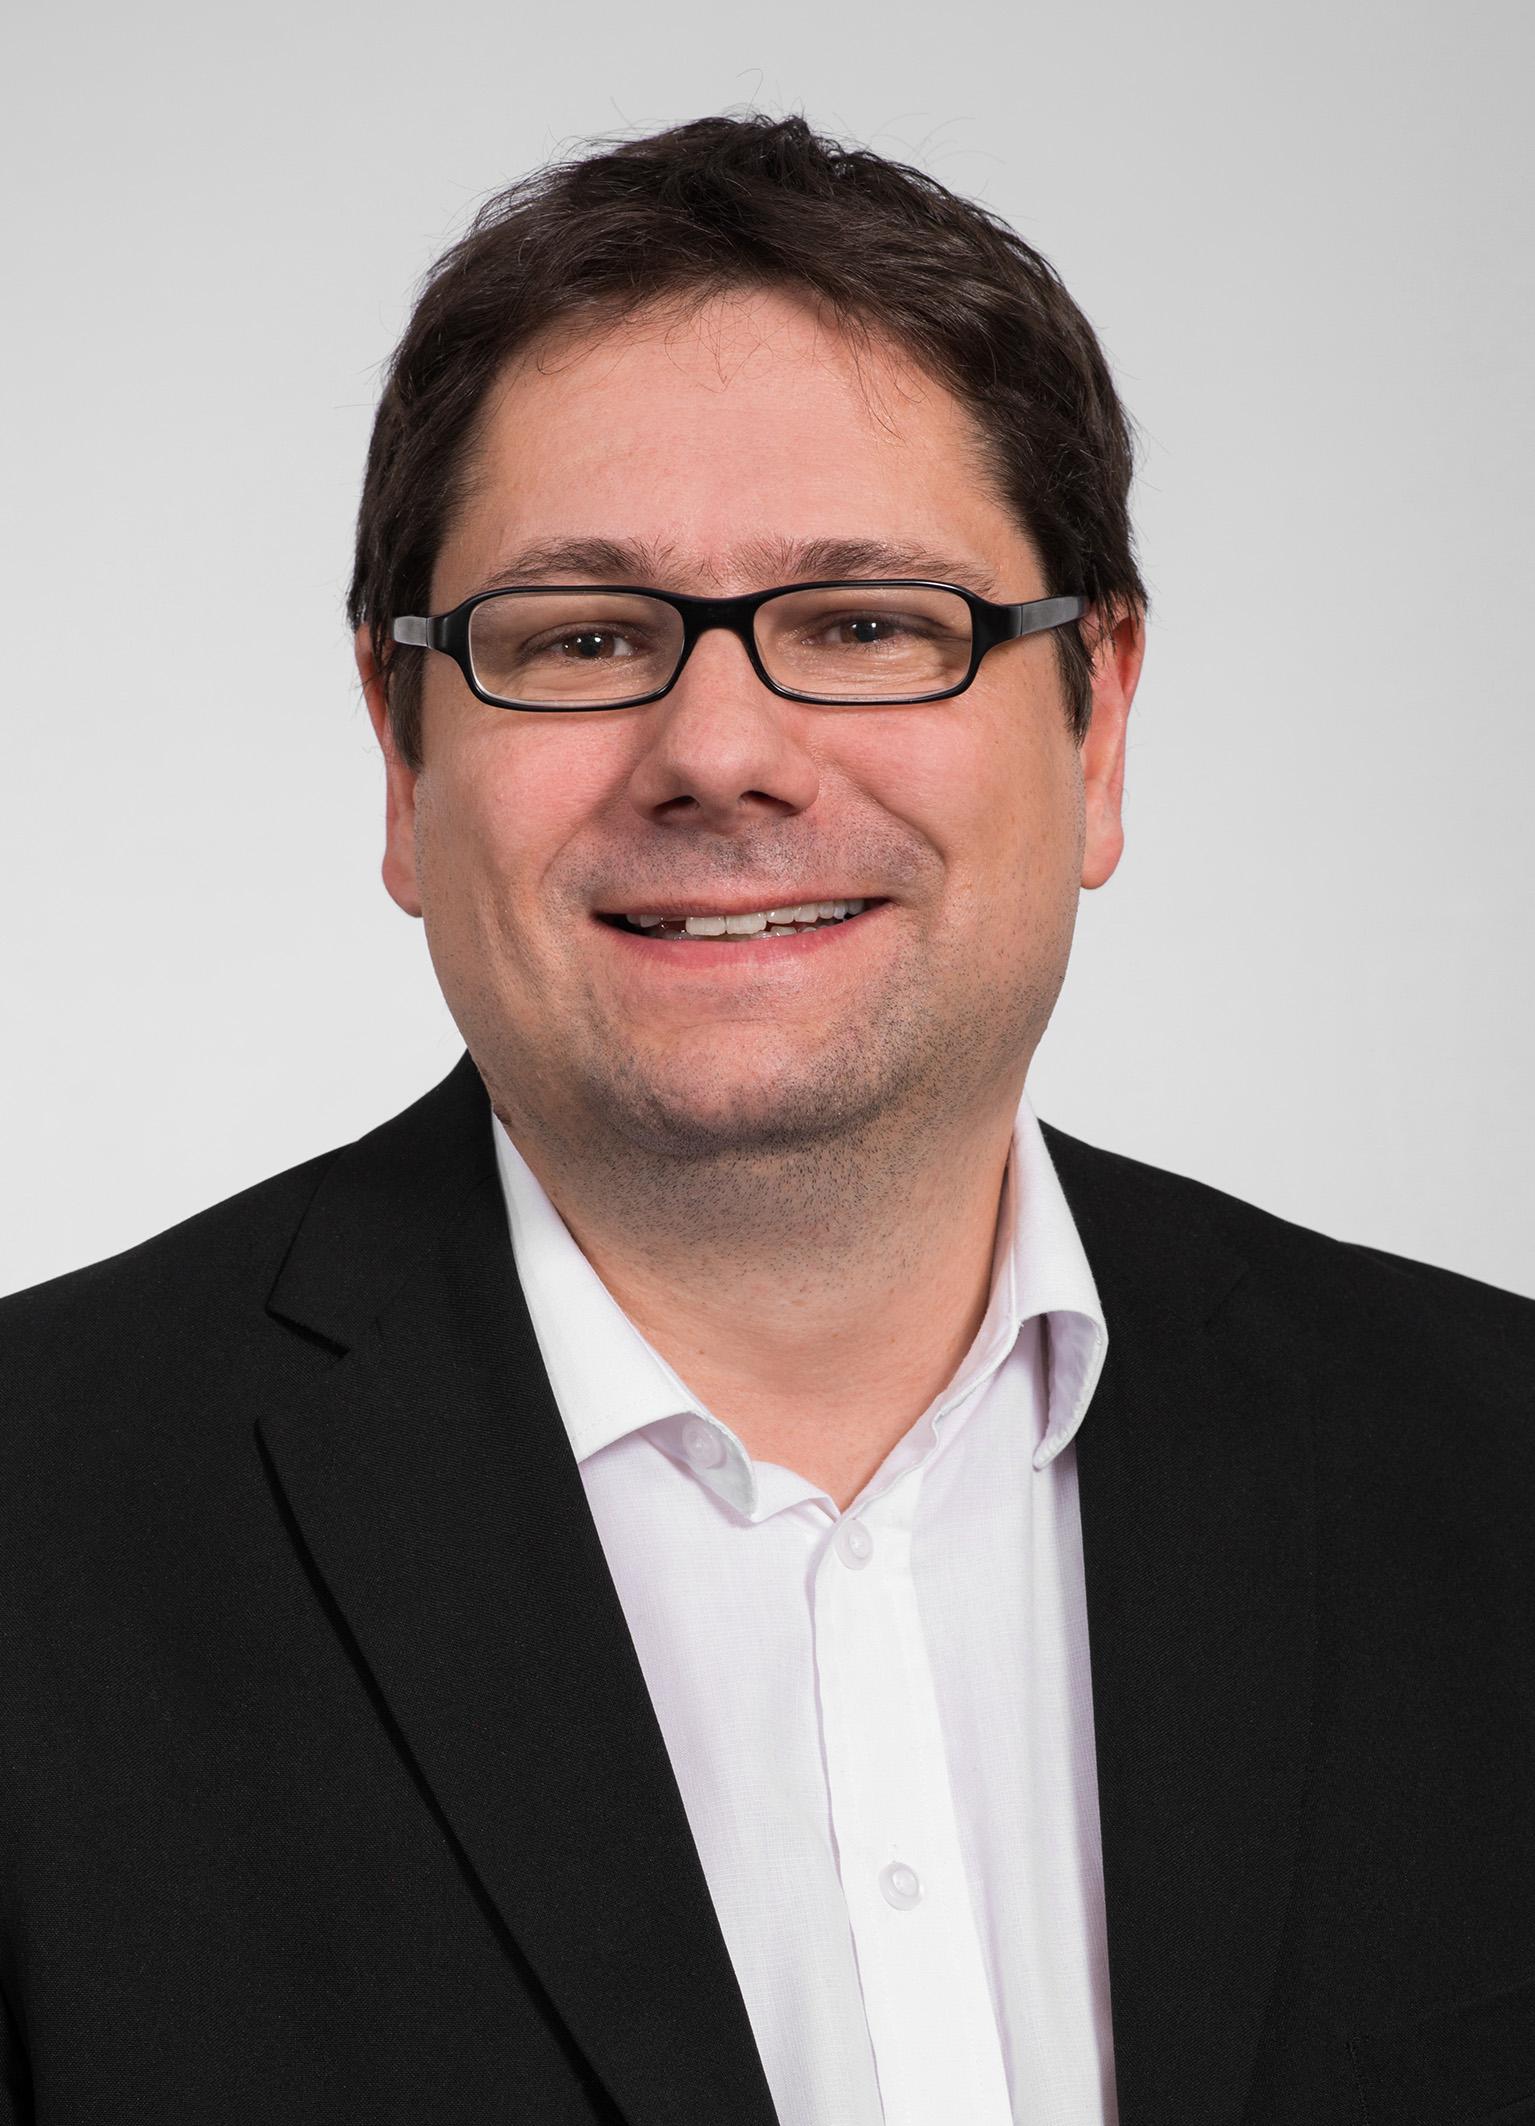 FH-Prof. Mag. Helmut Kammerzelt, MAS